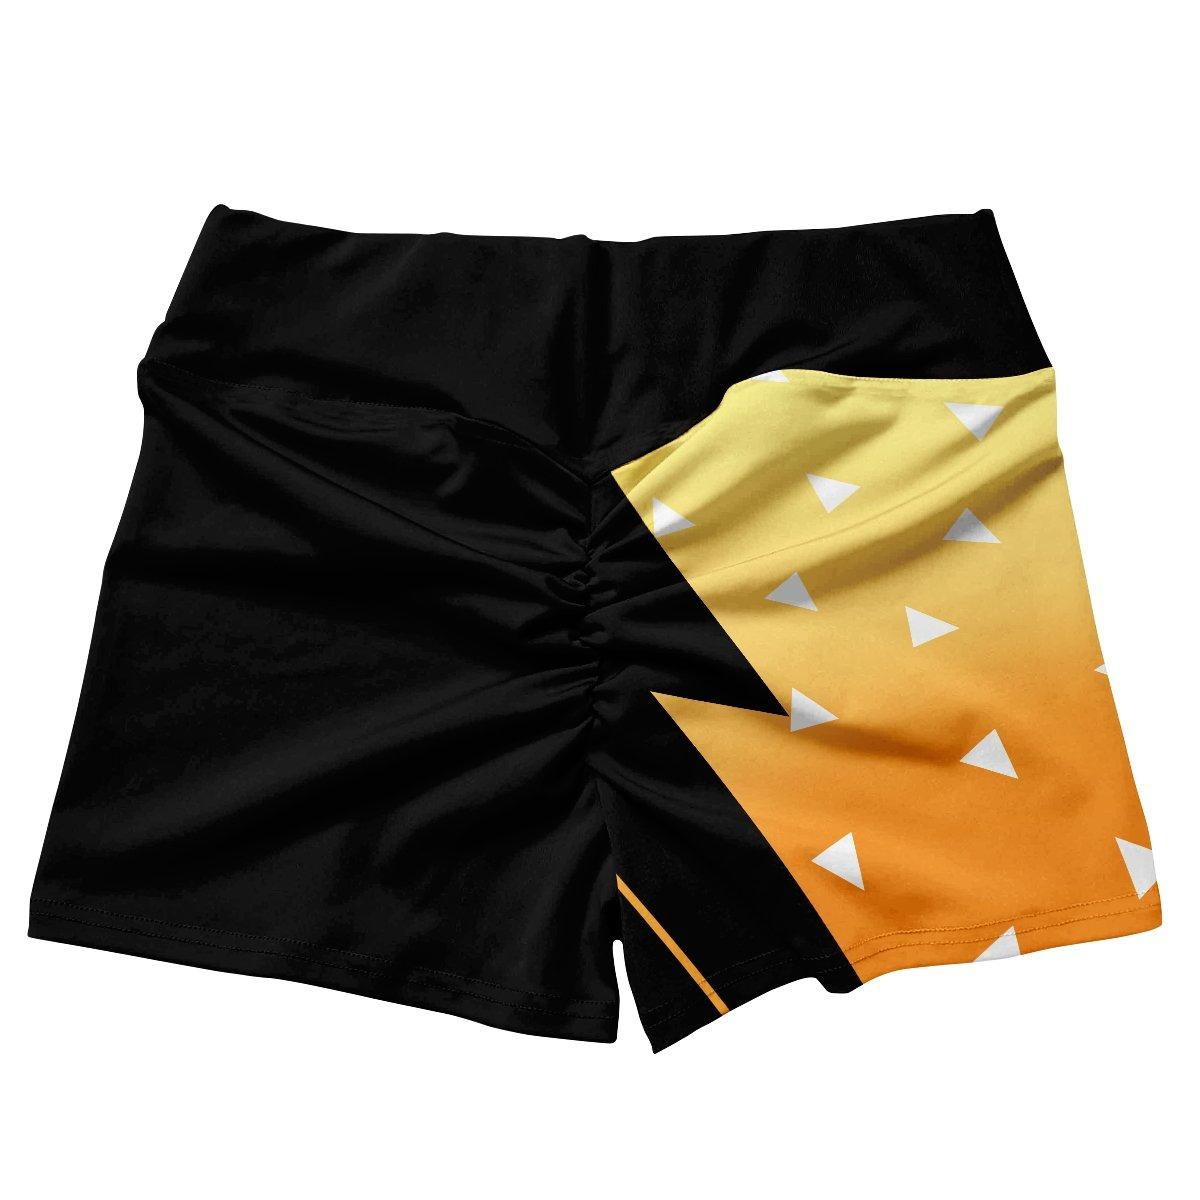 summer zenitsu active wear set 484292 - Anime Swimsuits